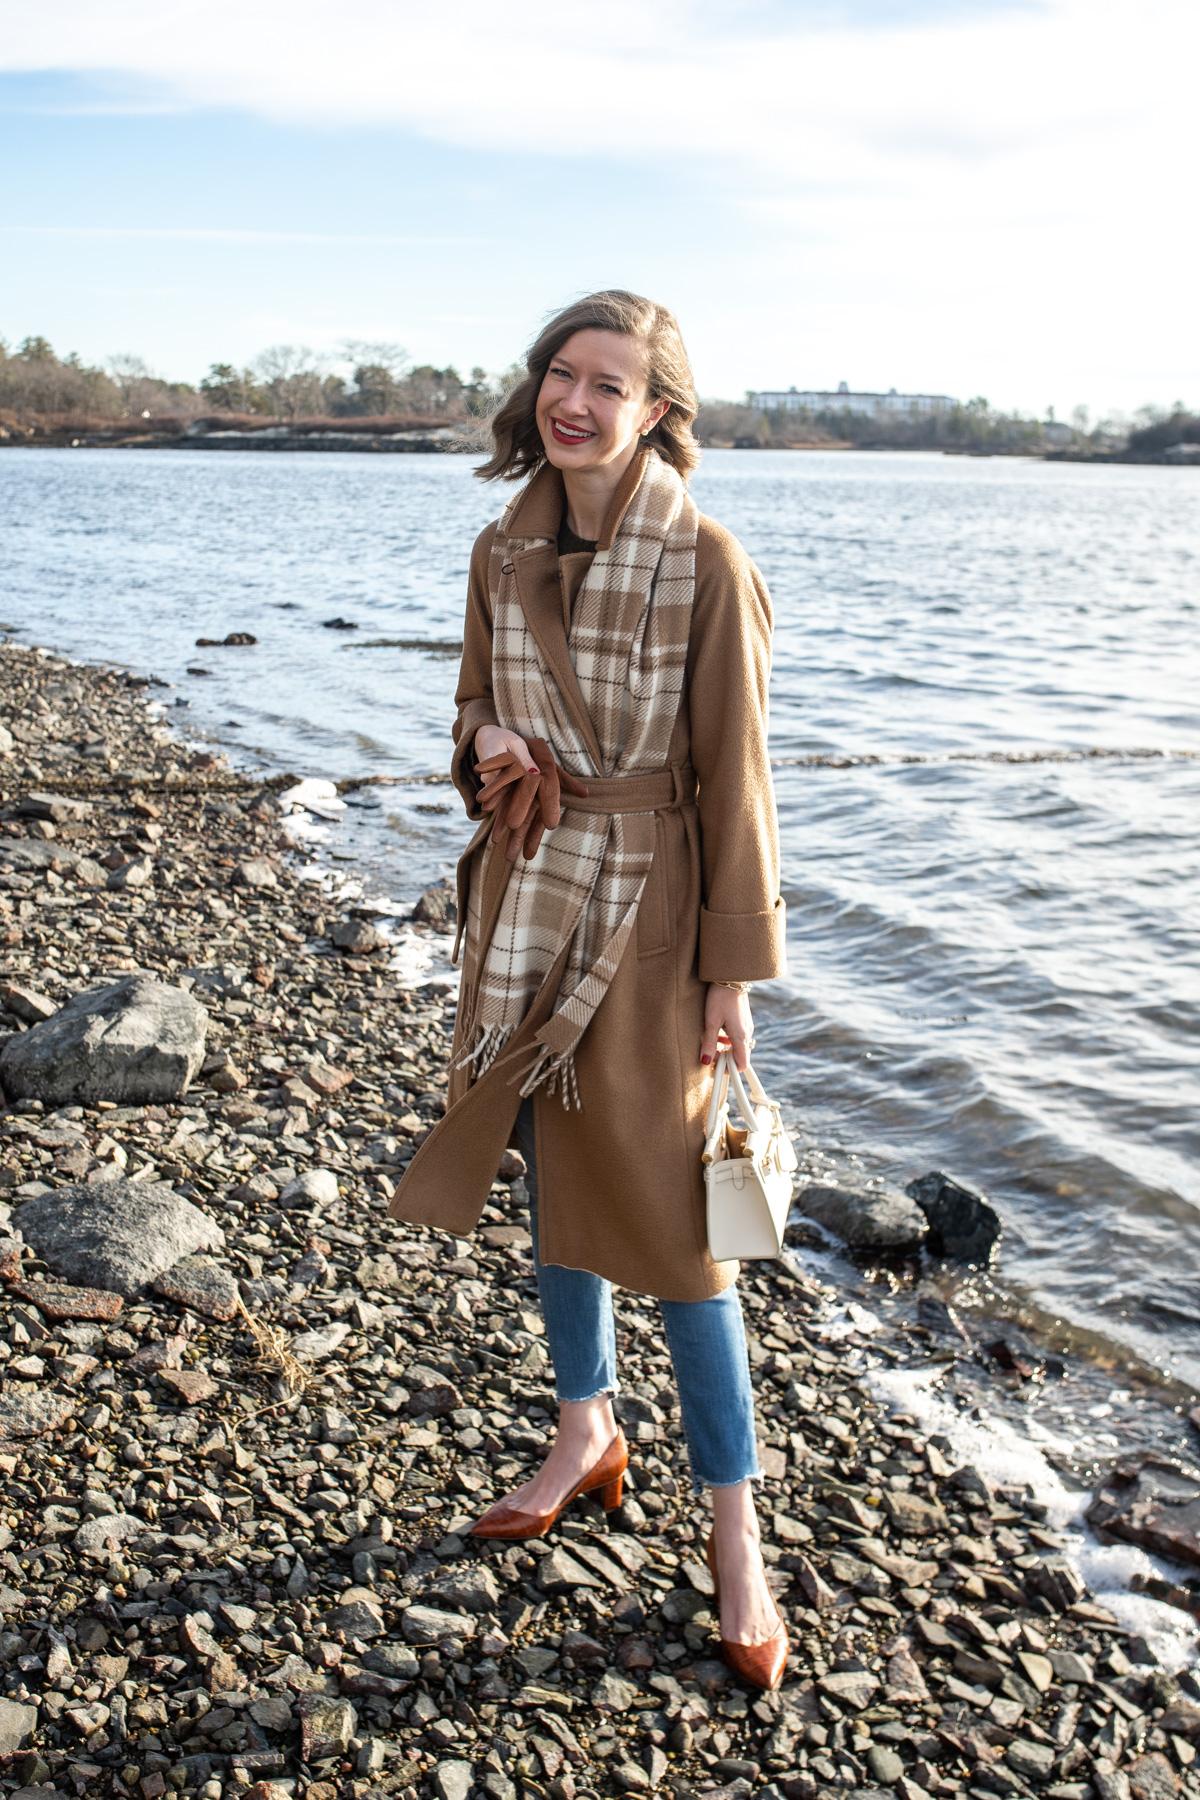 Stacie Flinner x Camel Monochromatic Outfit-4.jpg